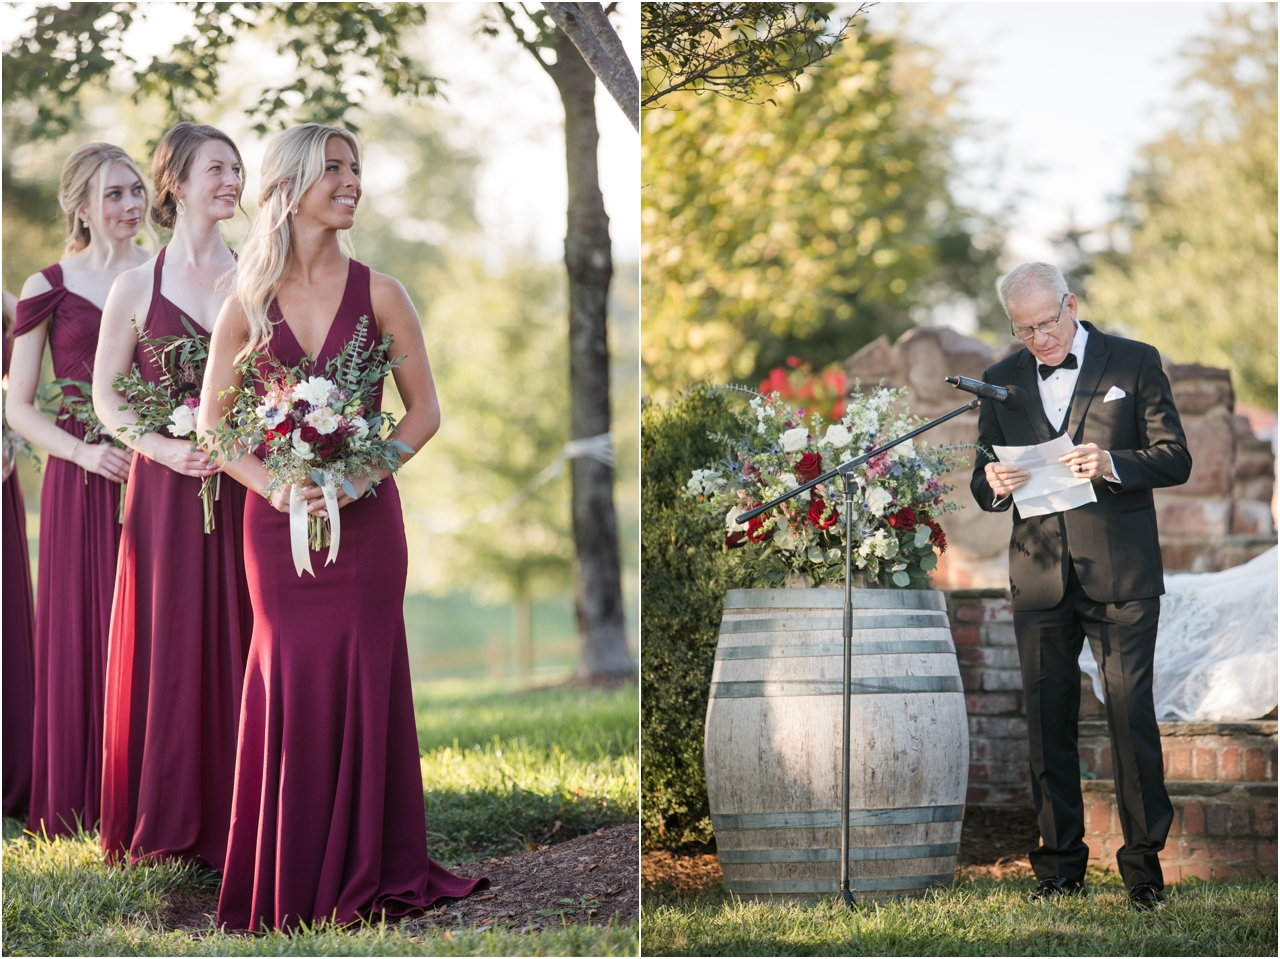 Bull_Run_Winery_Wedding_016